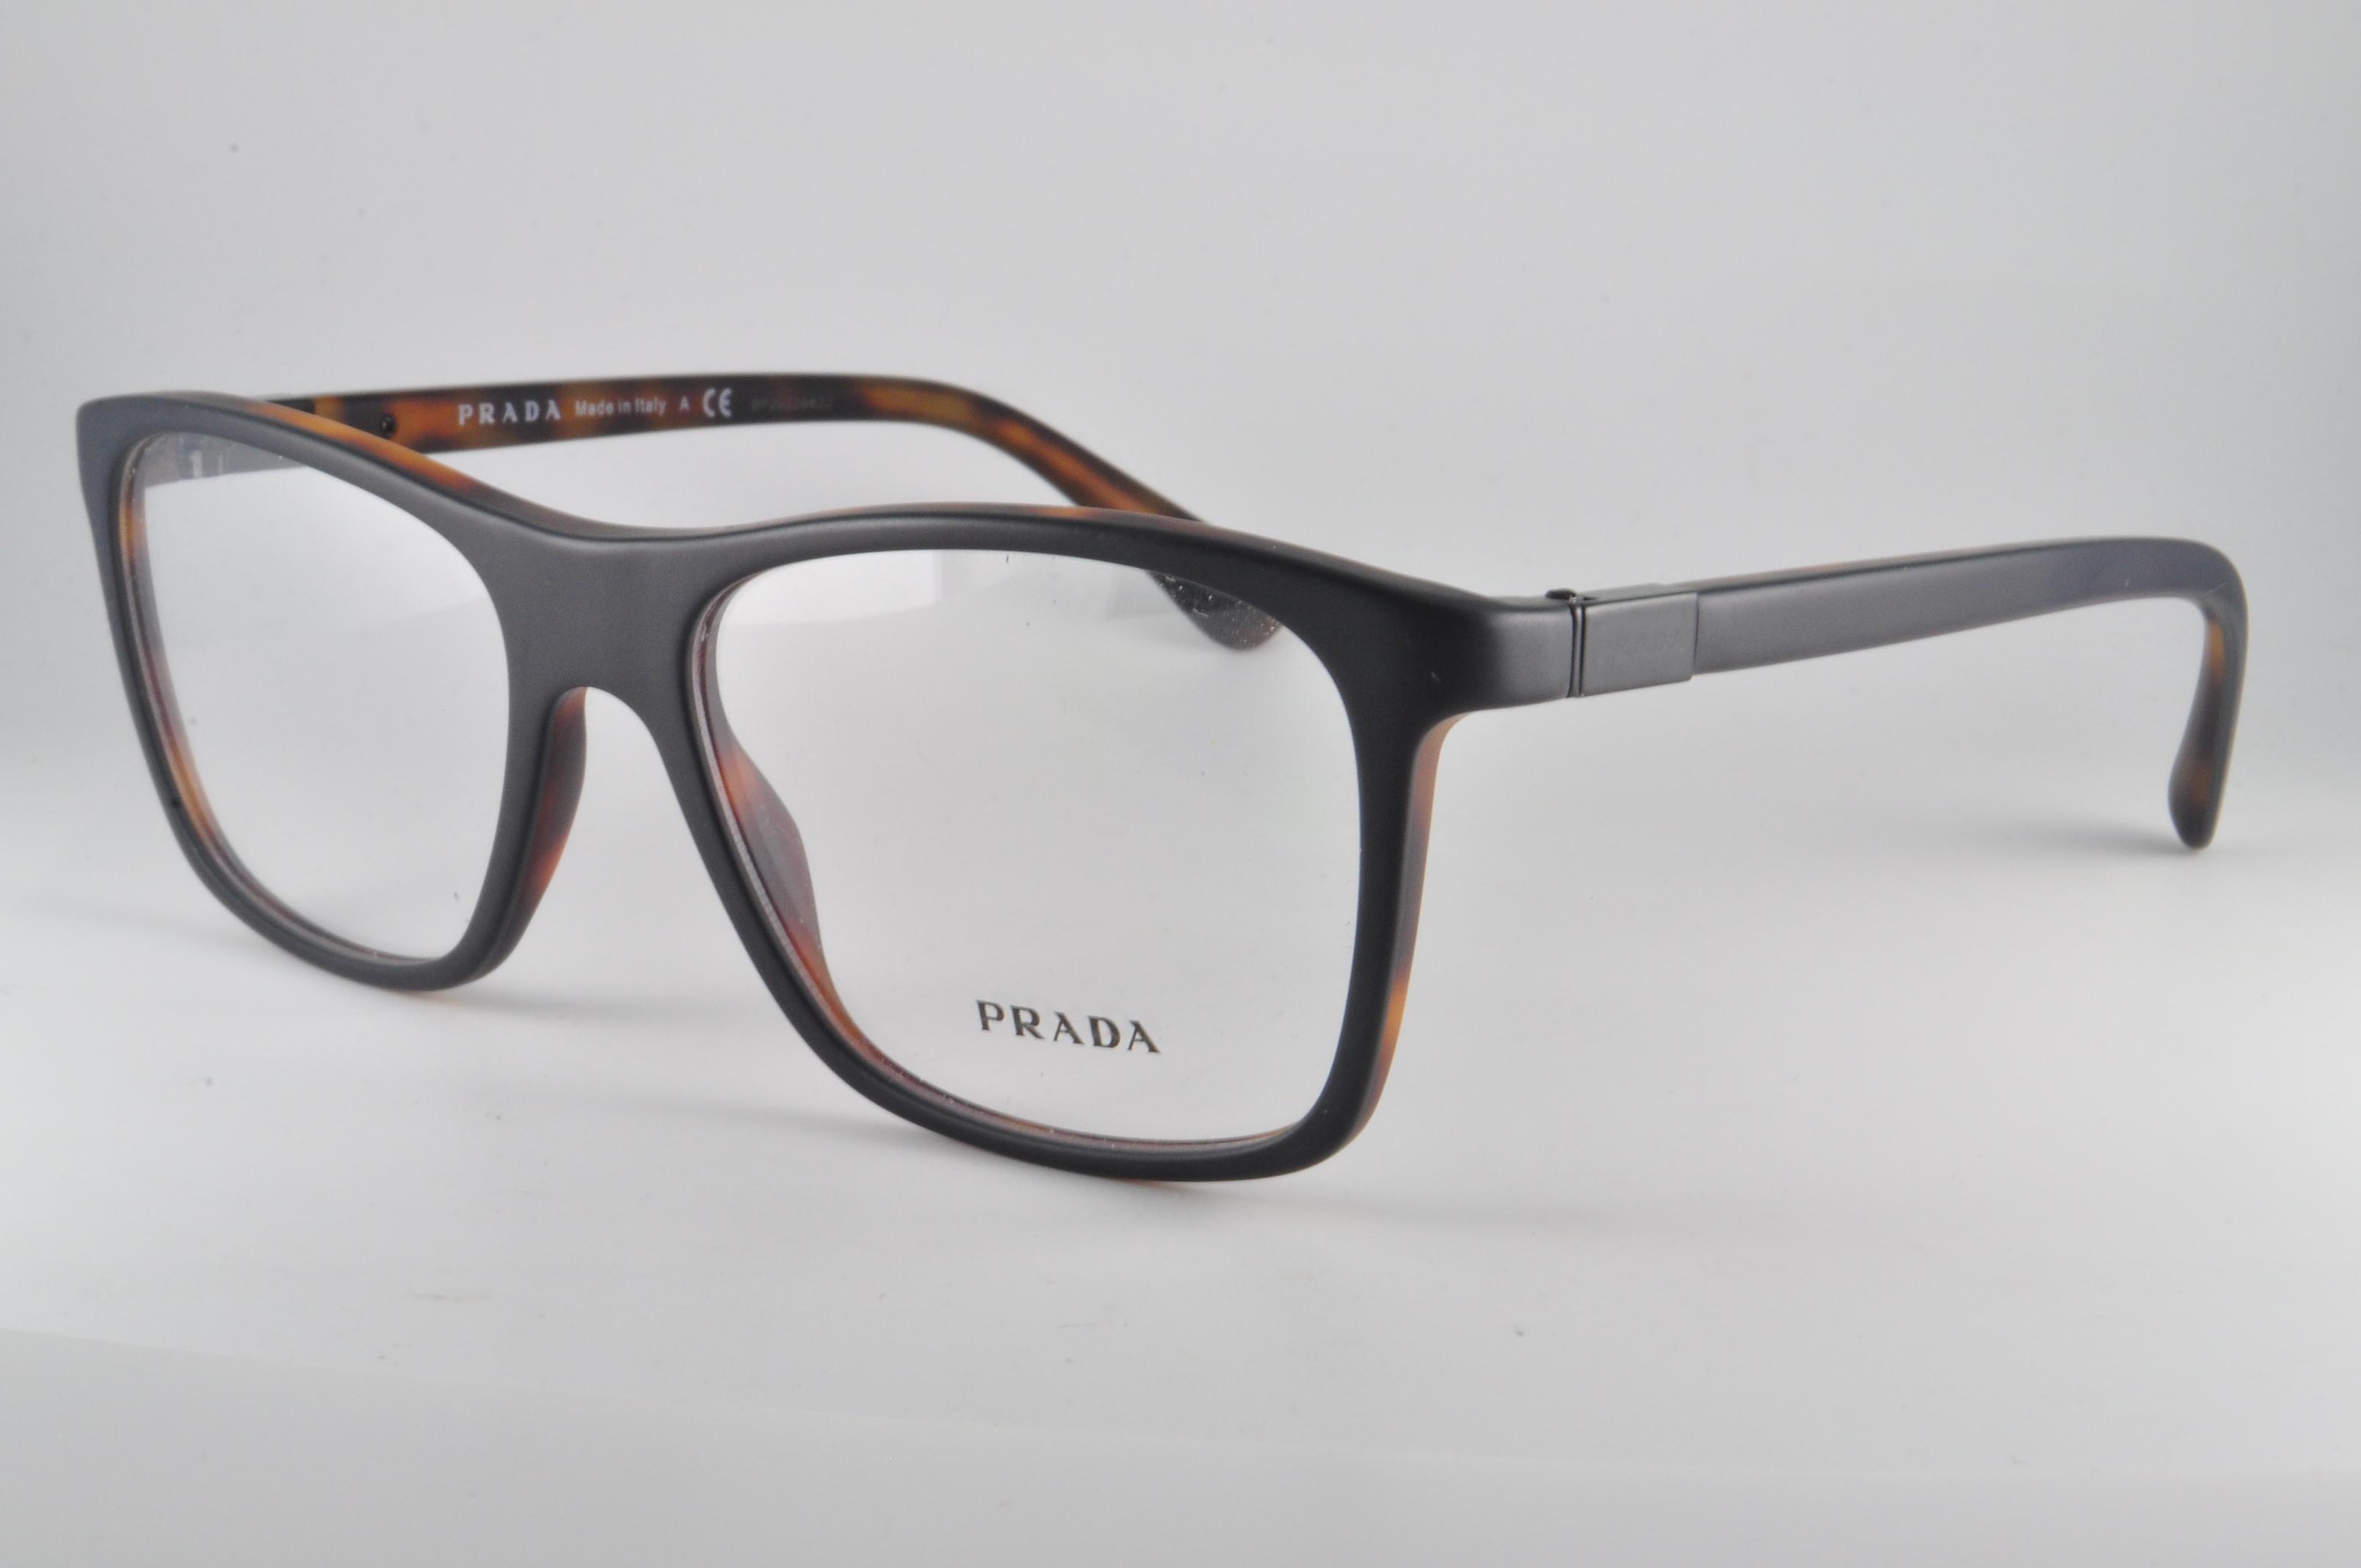 c49261816dc91 ... canada image is loading prada eyeglasses pr 05s ubh1o1 black matte  tortoise dca1a 193f9